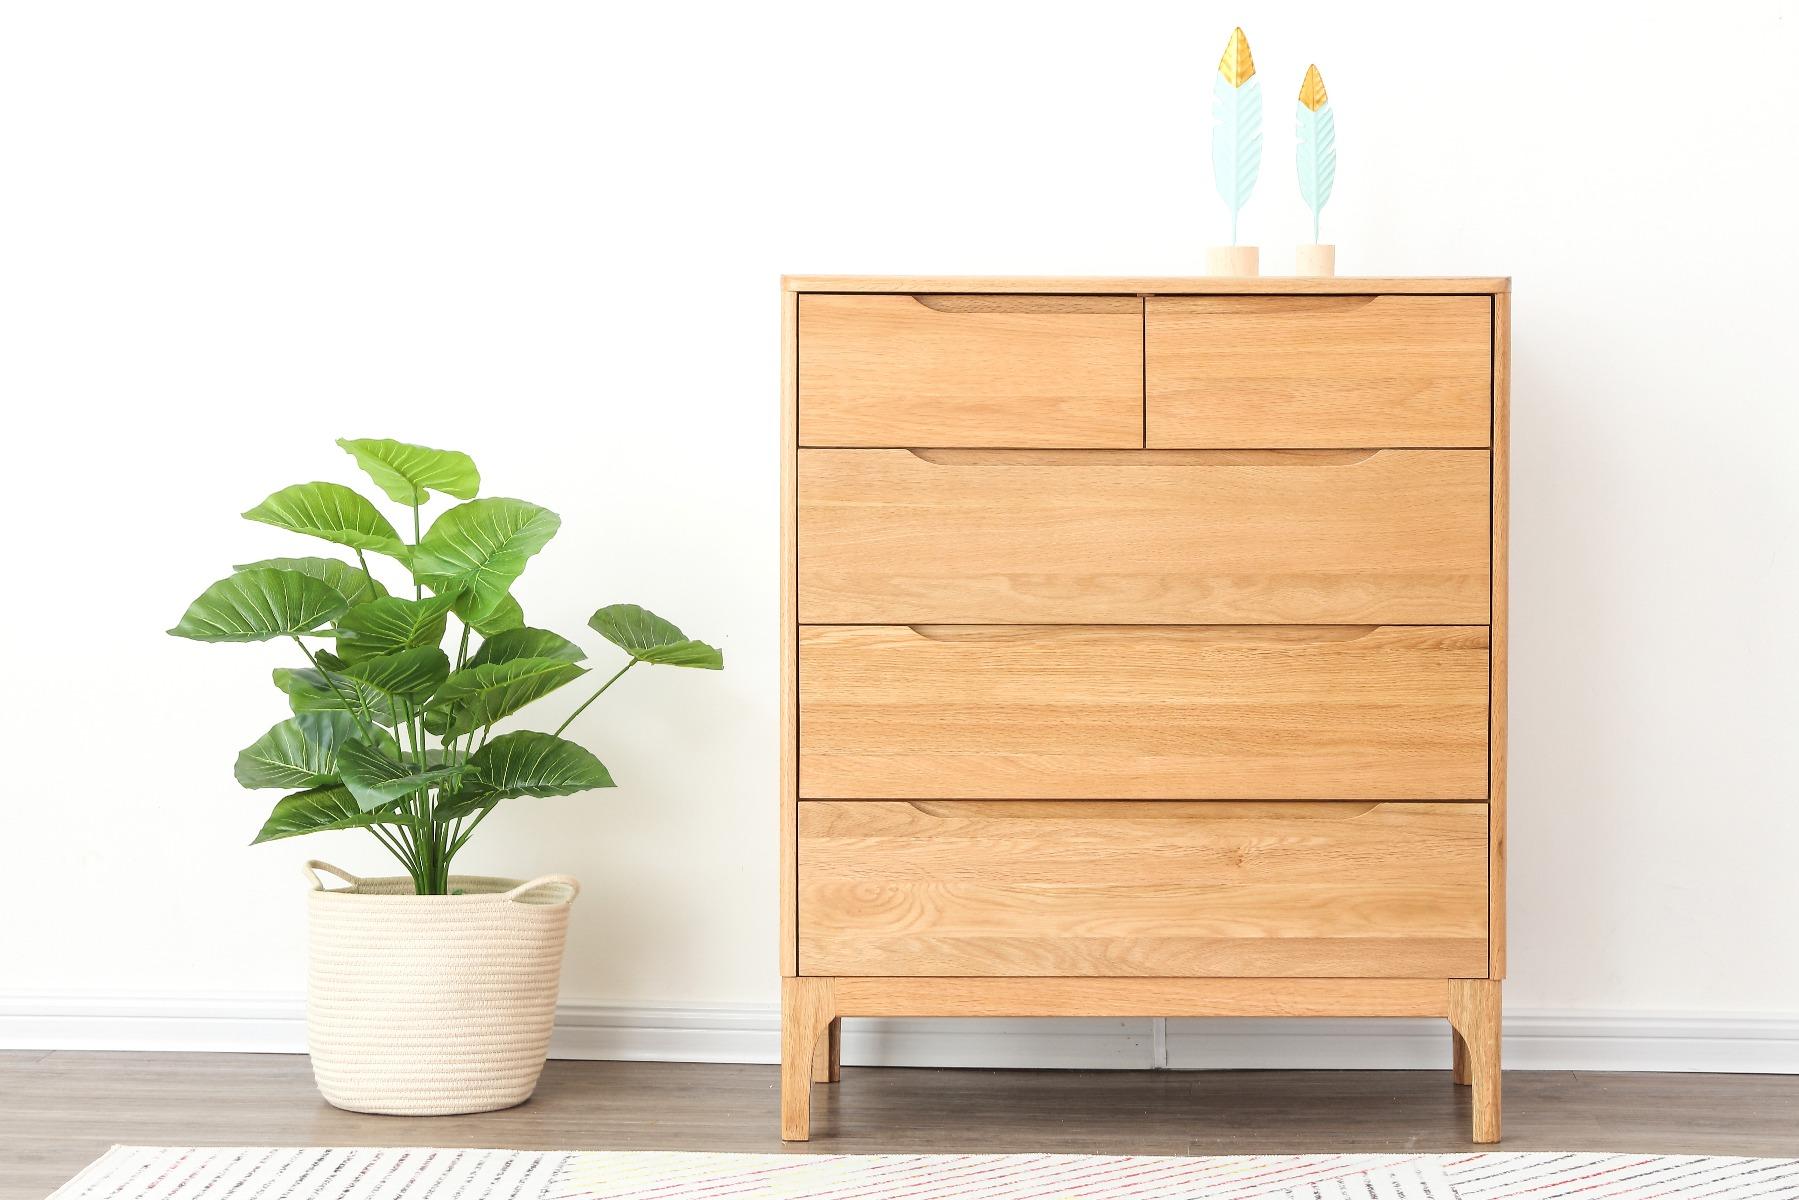 Scandinavian minimalist design. Built for contemporary homes.